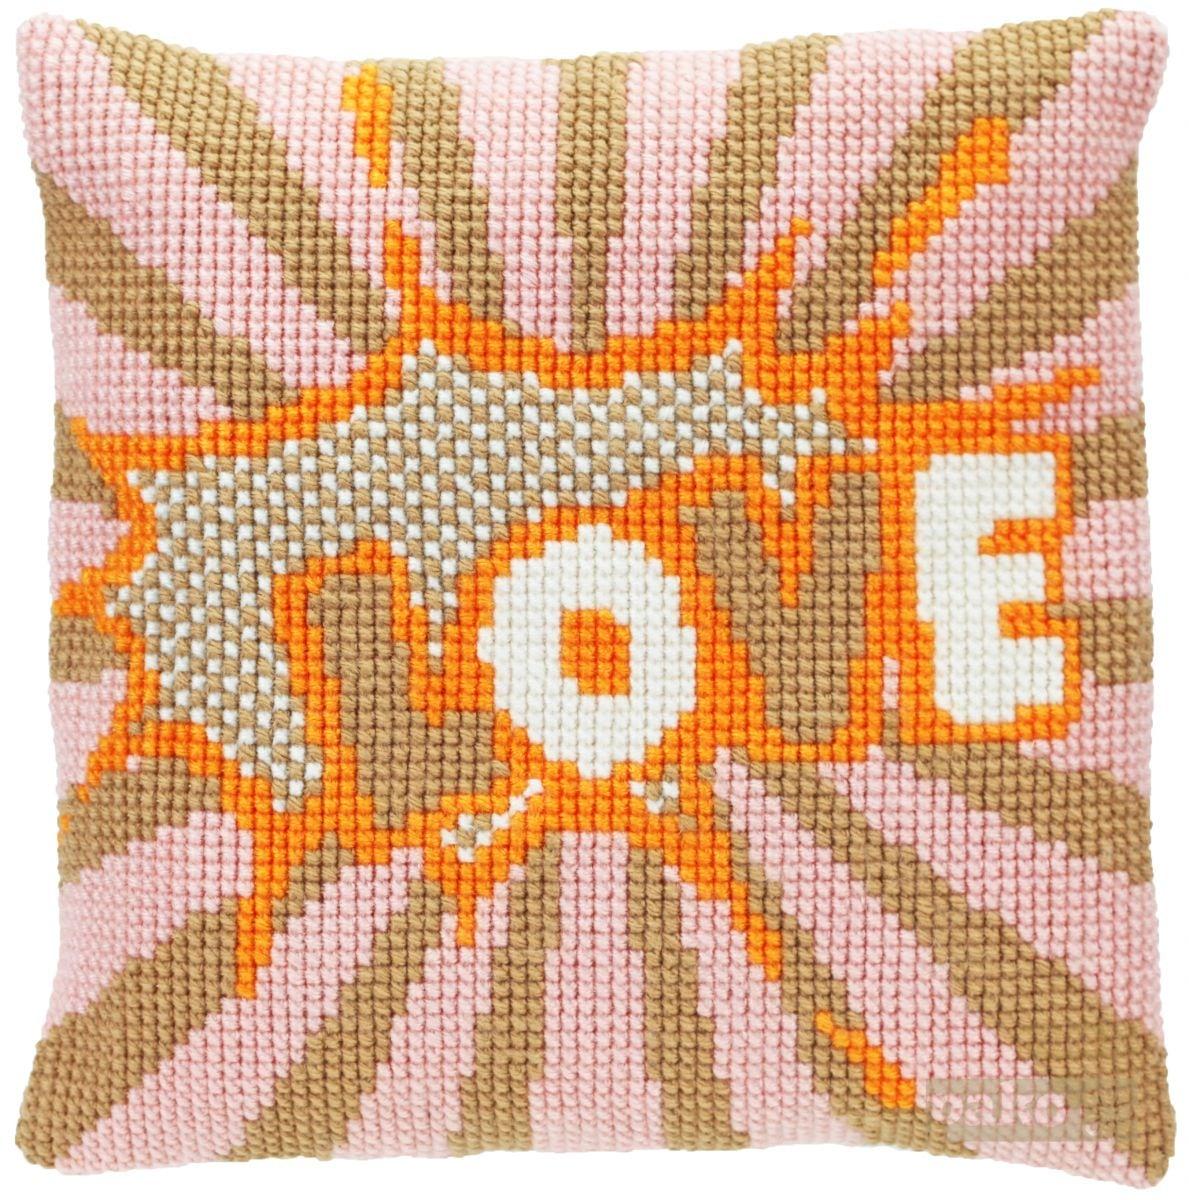 cross stitch cushion love printed